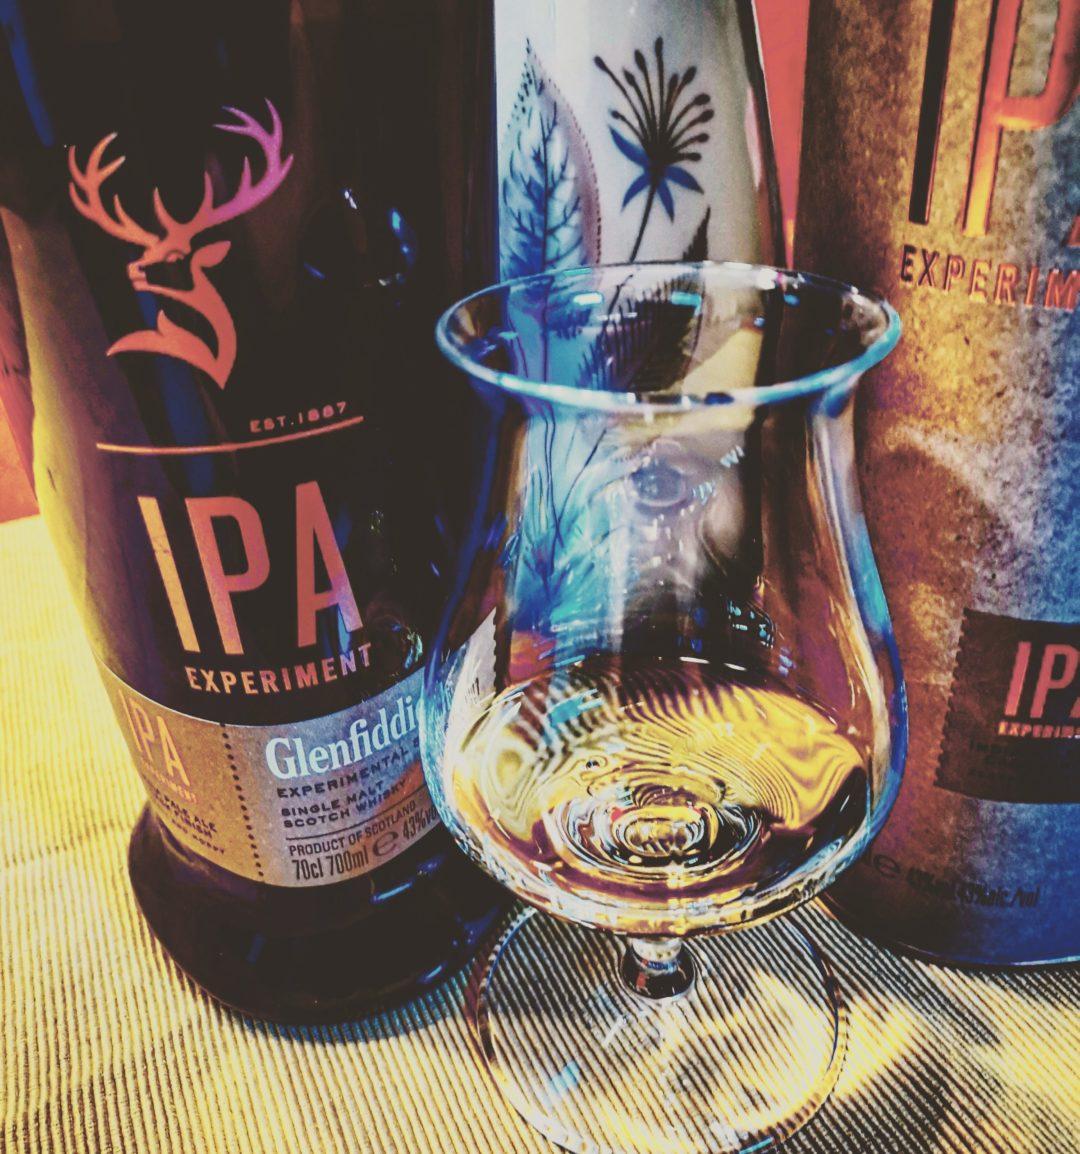 Glenfiddich IPA Single Malt Scotch Whisky